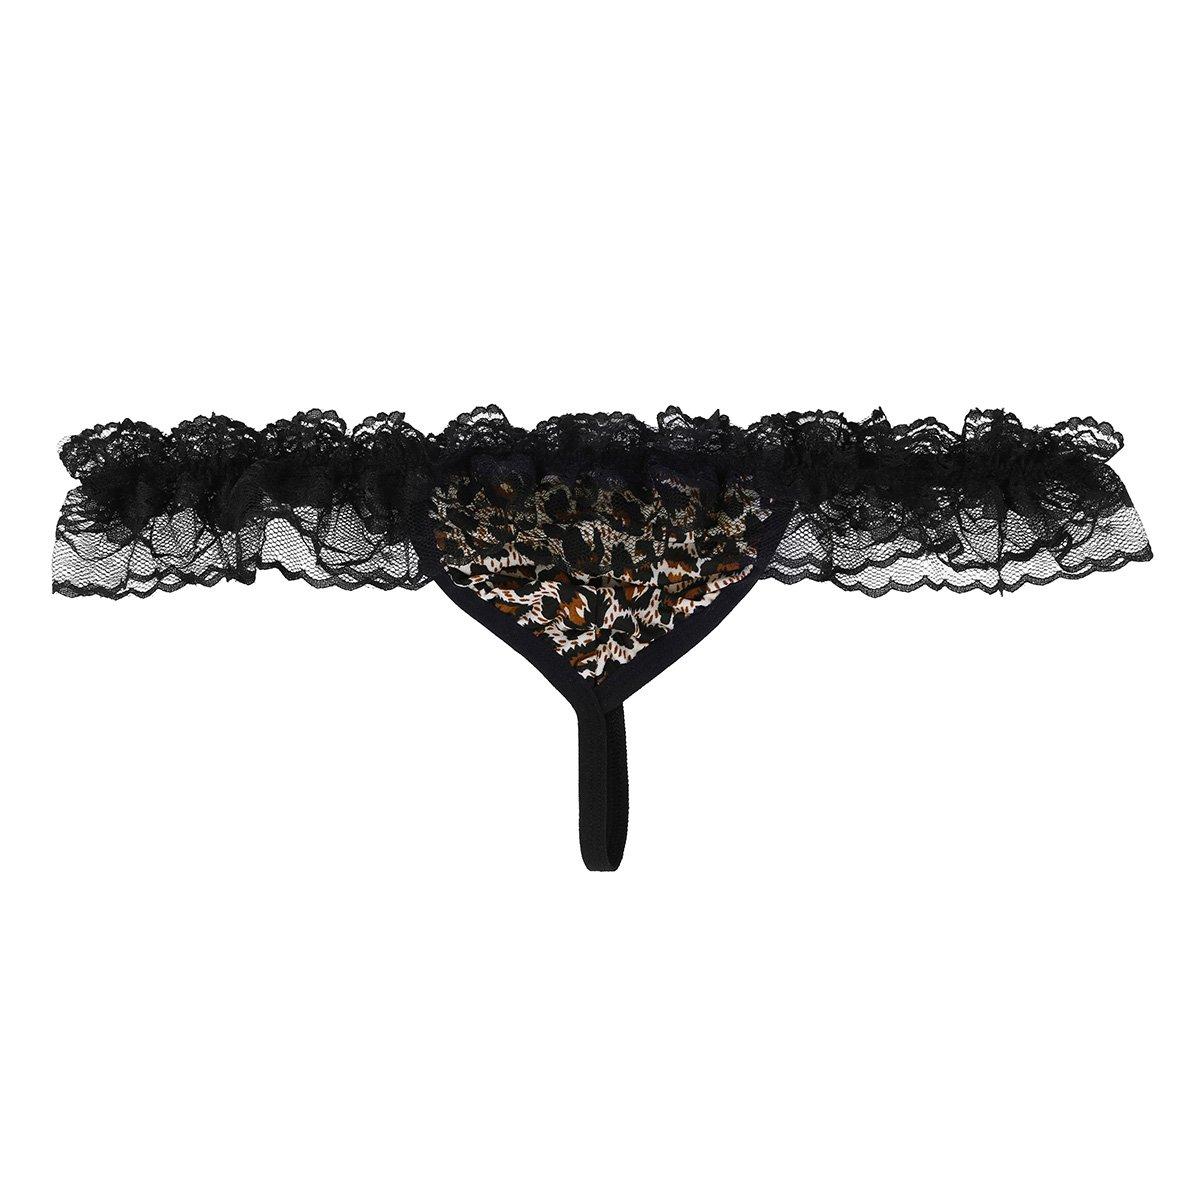 c11f6e05b23 Amazon.com  ACSUSS Sissy Men s Lace Panties Floral G-String Ruffled T-Back  Thong Bikini Briefs  Clothing